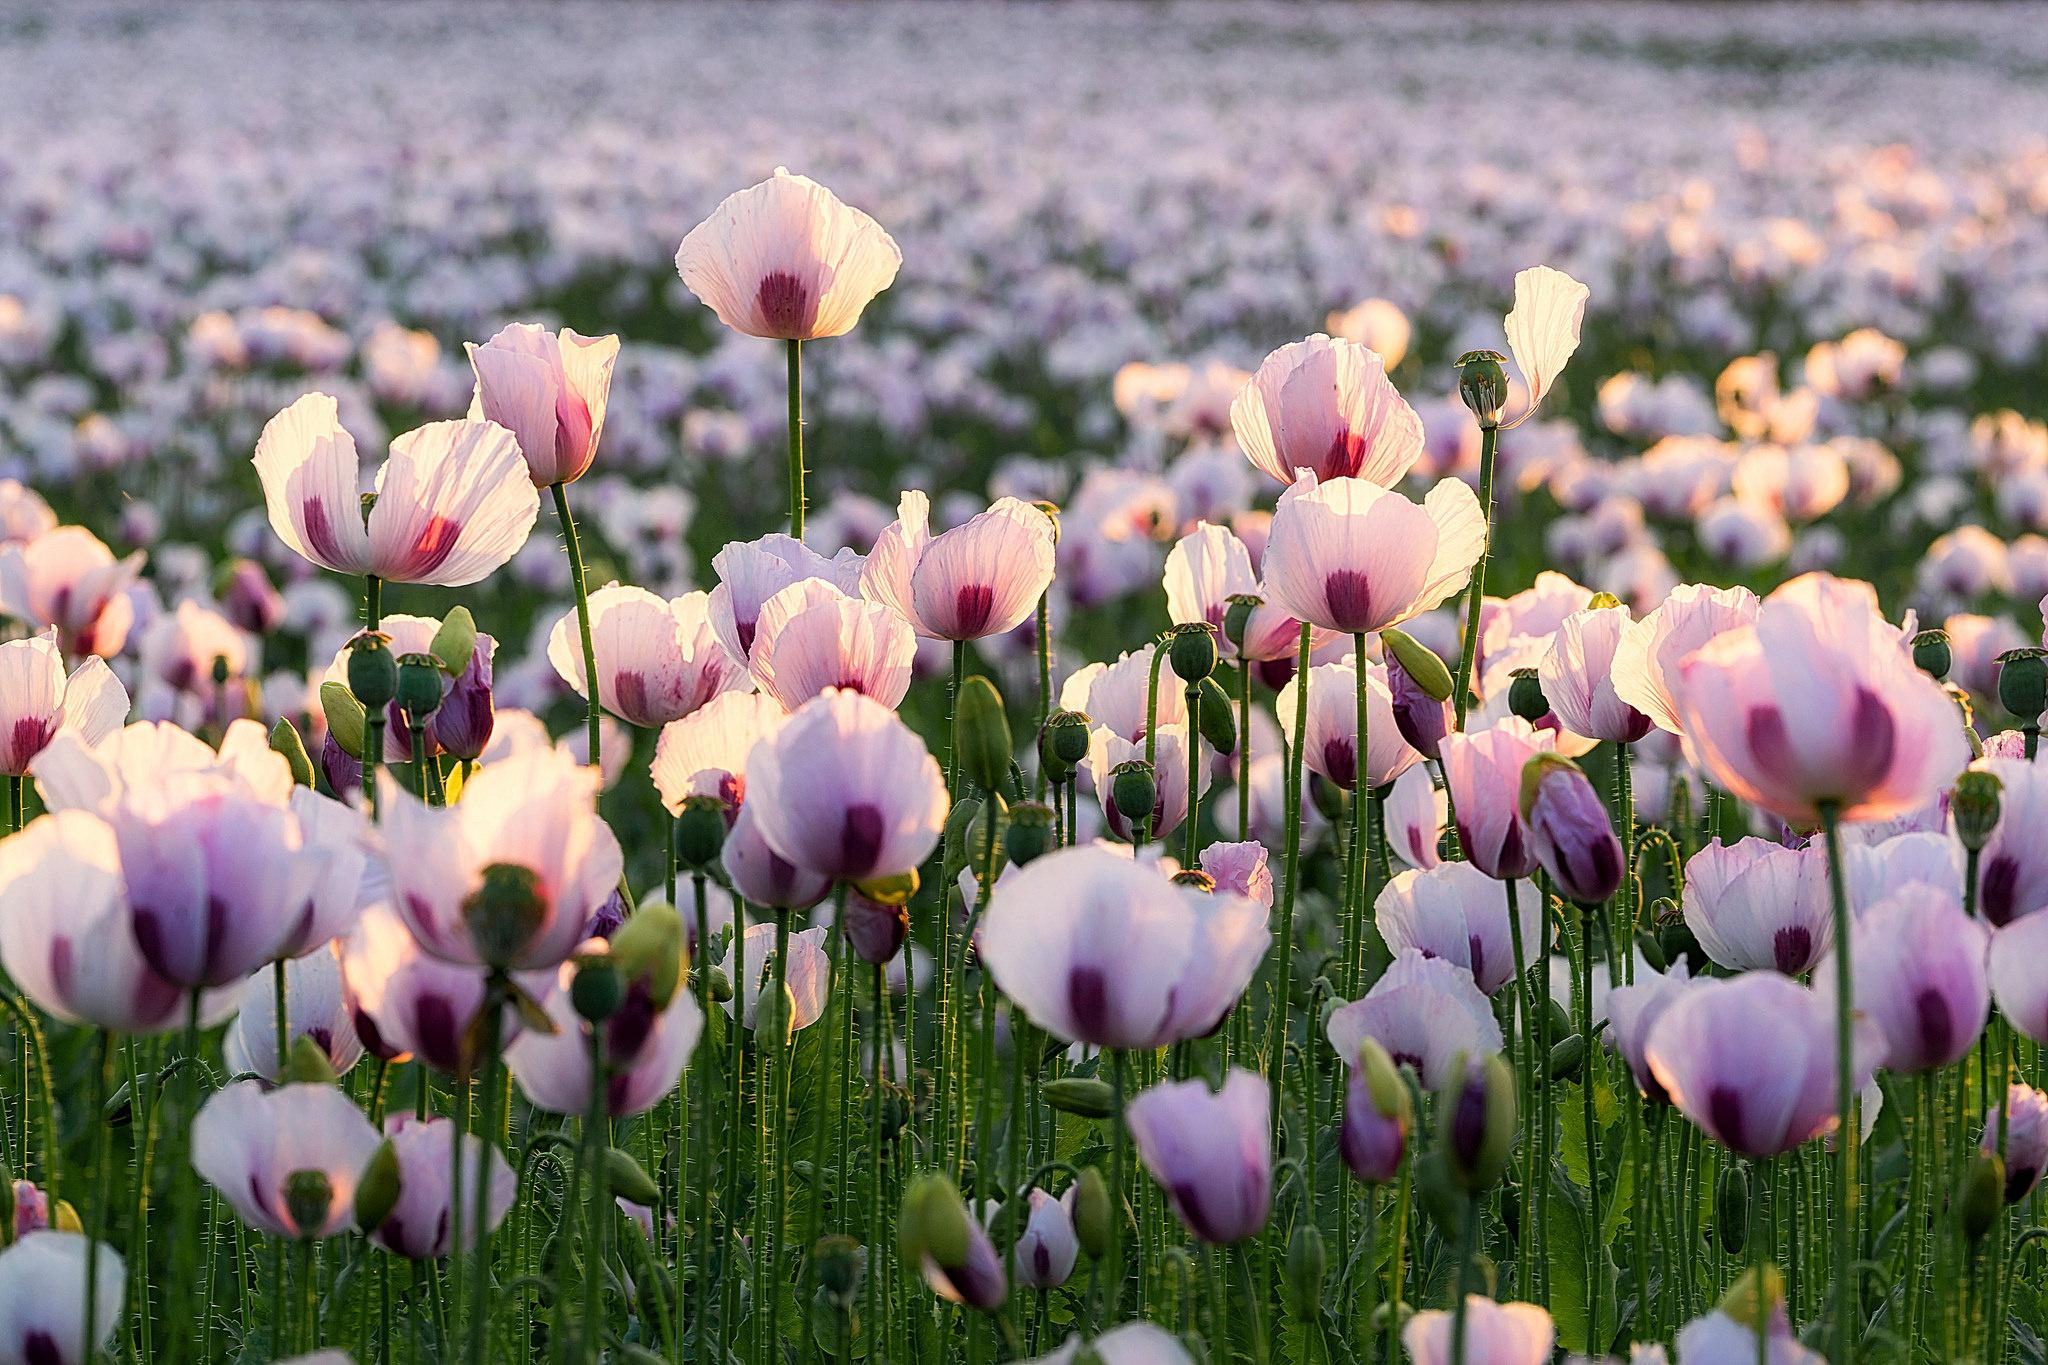 Fiori Wallpaper.Flower Hd Wallpaper Background Image 2048x1365 Id 902499